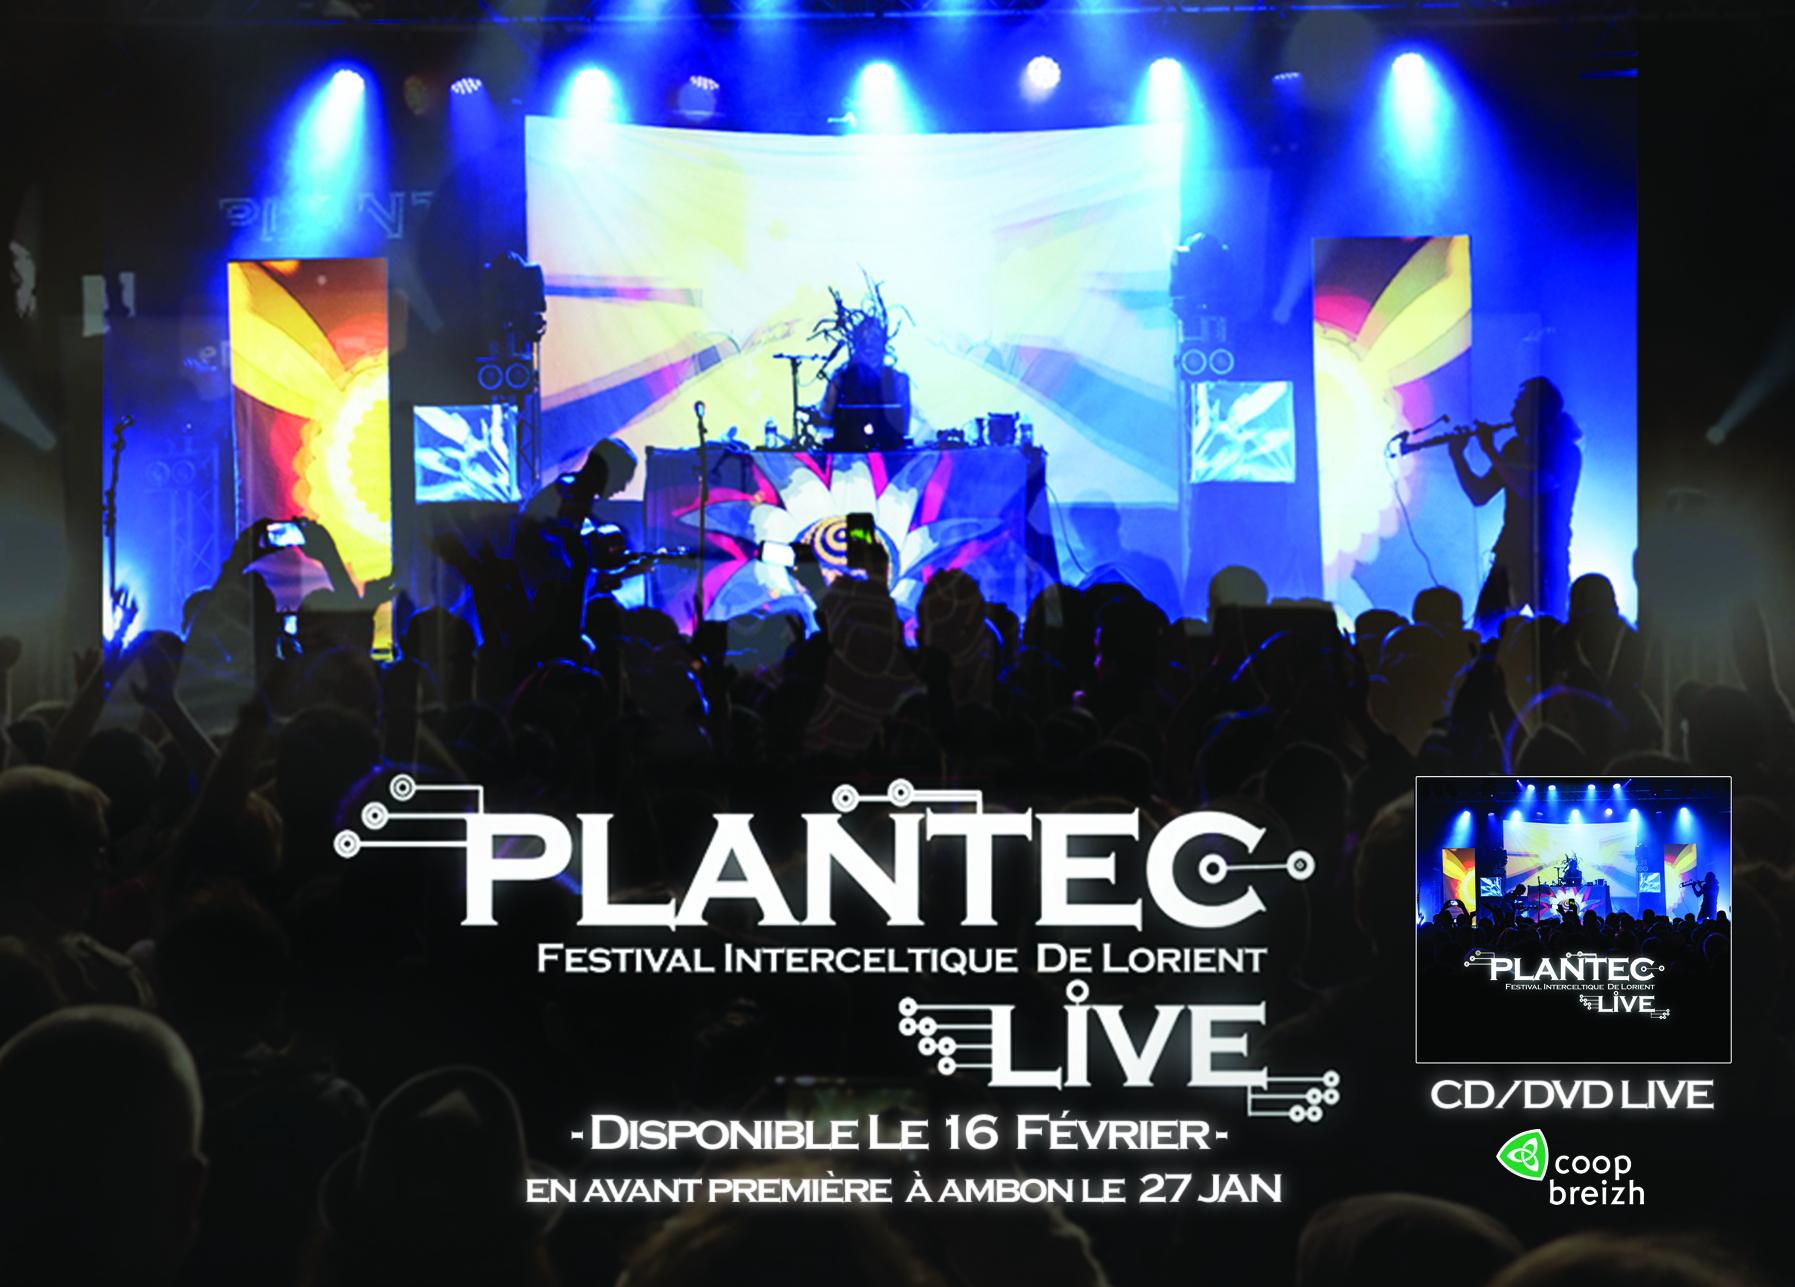 Plantec_Winter_noz_18_Flyer_DIN_A6_verso-1510234531.jpg